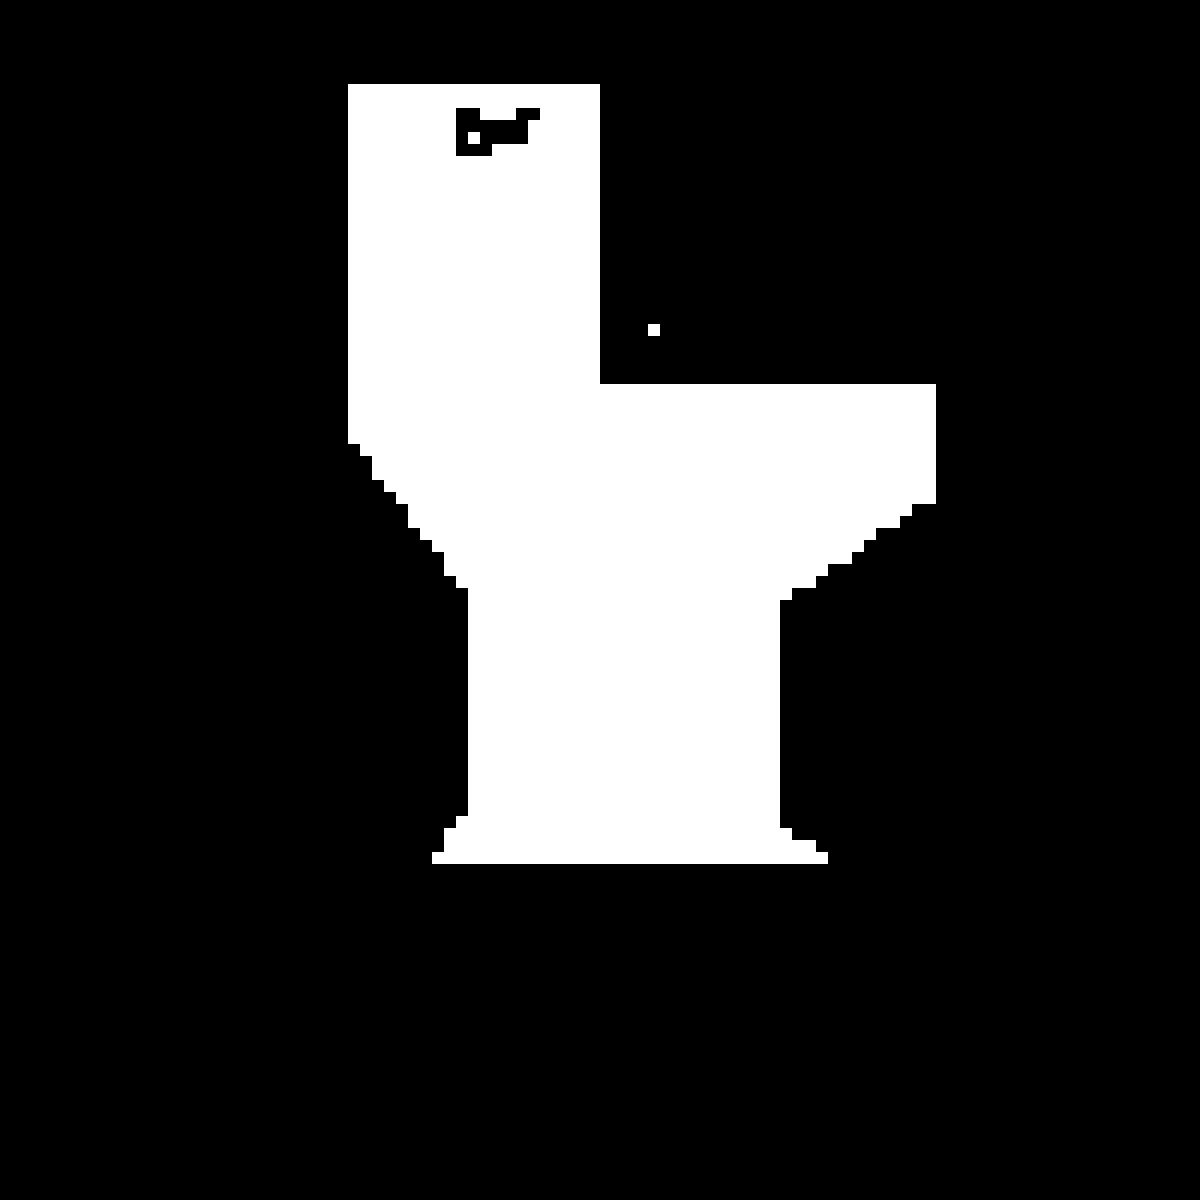 toilet by DEMON-DUDE